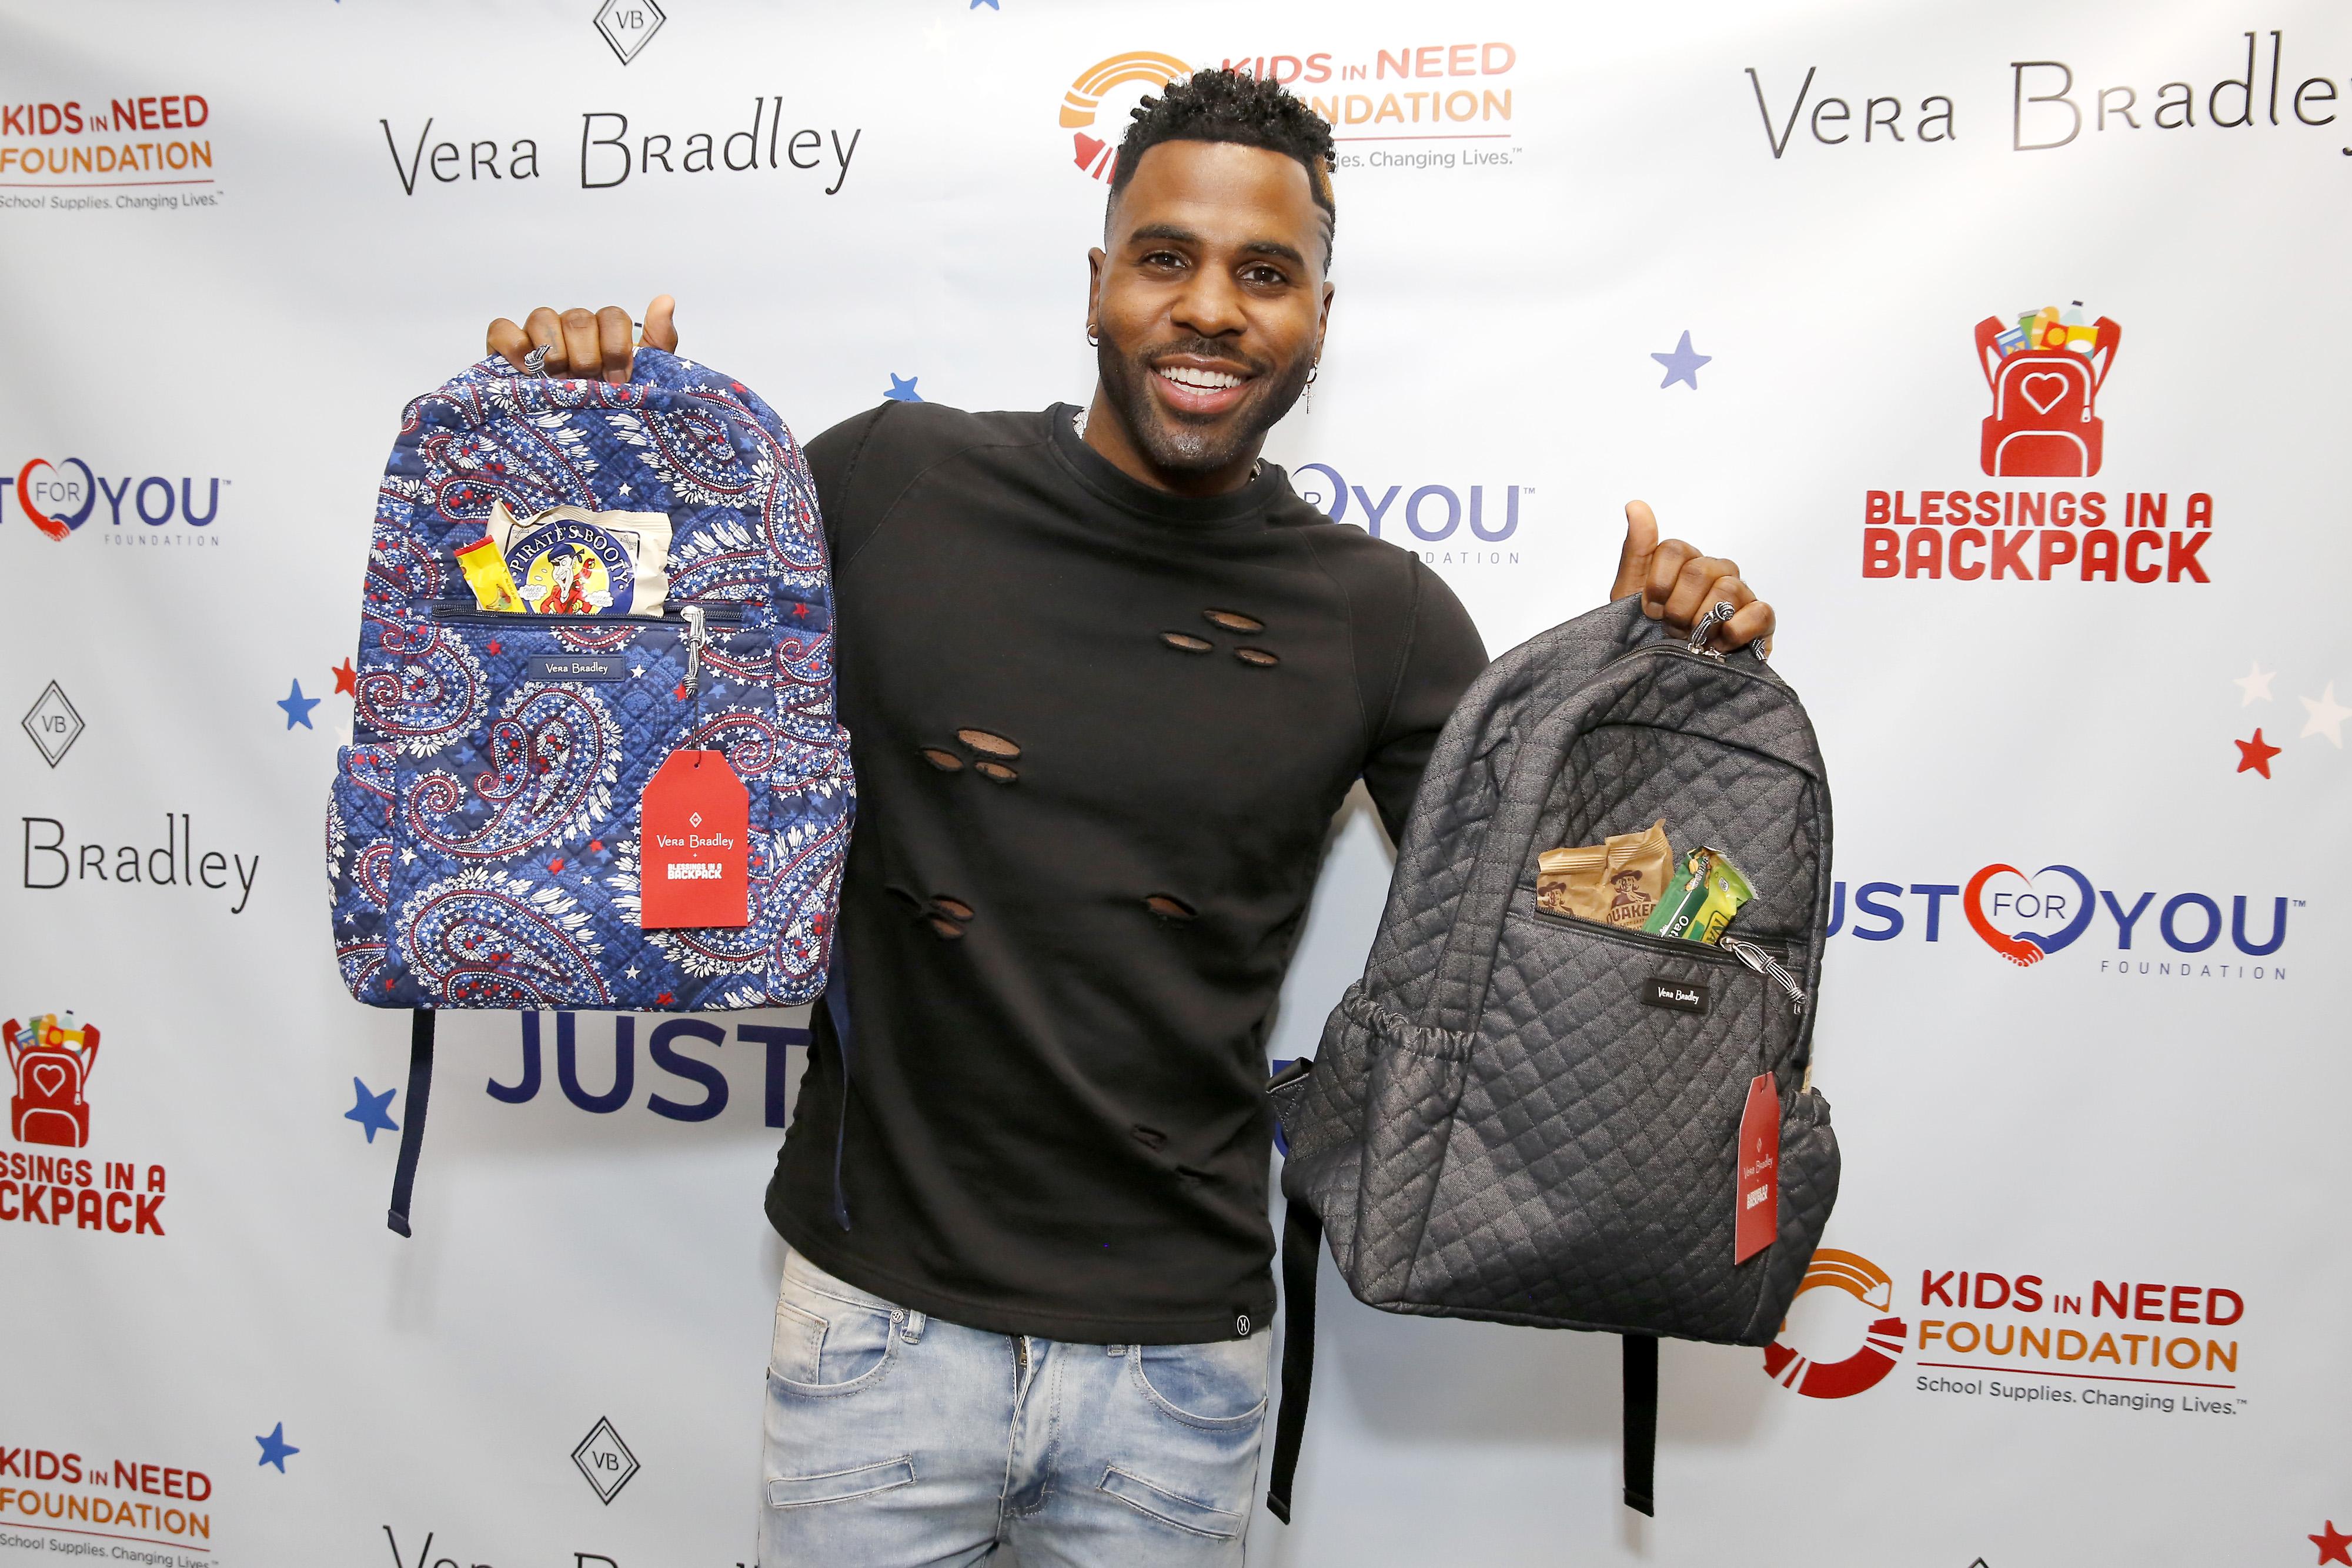 Jason Derulo with Vera Bradley backpacks